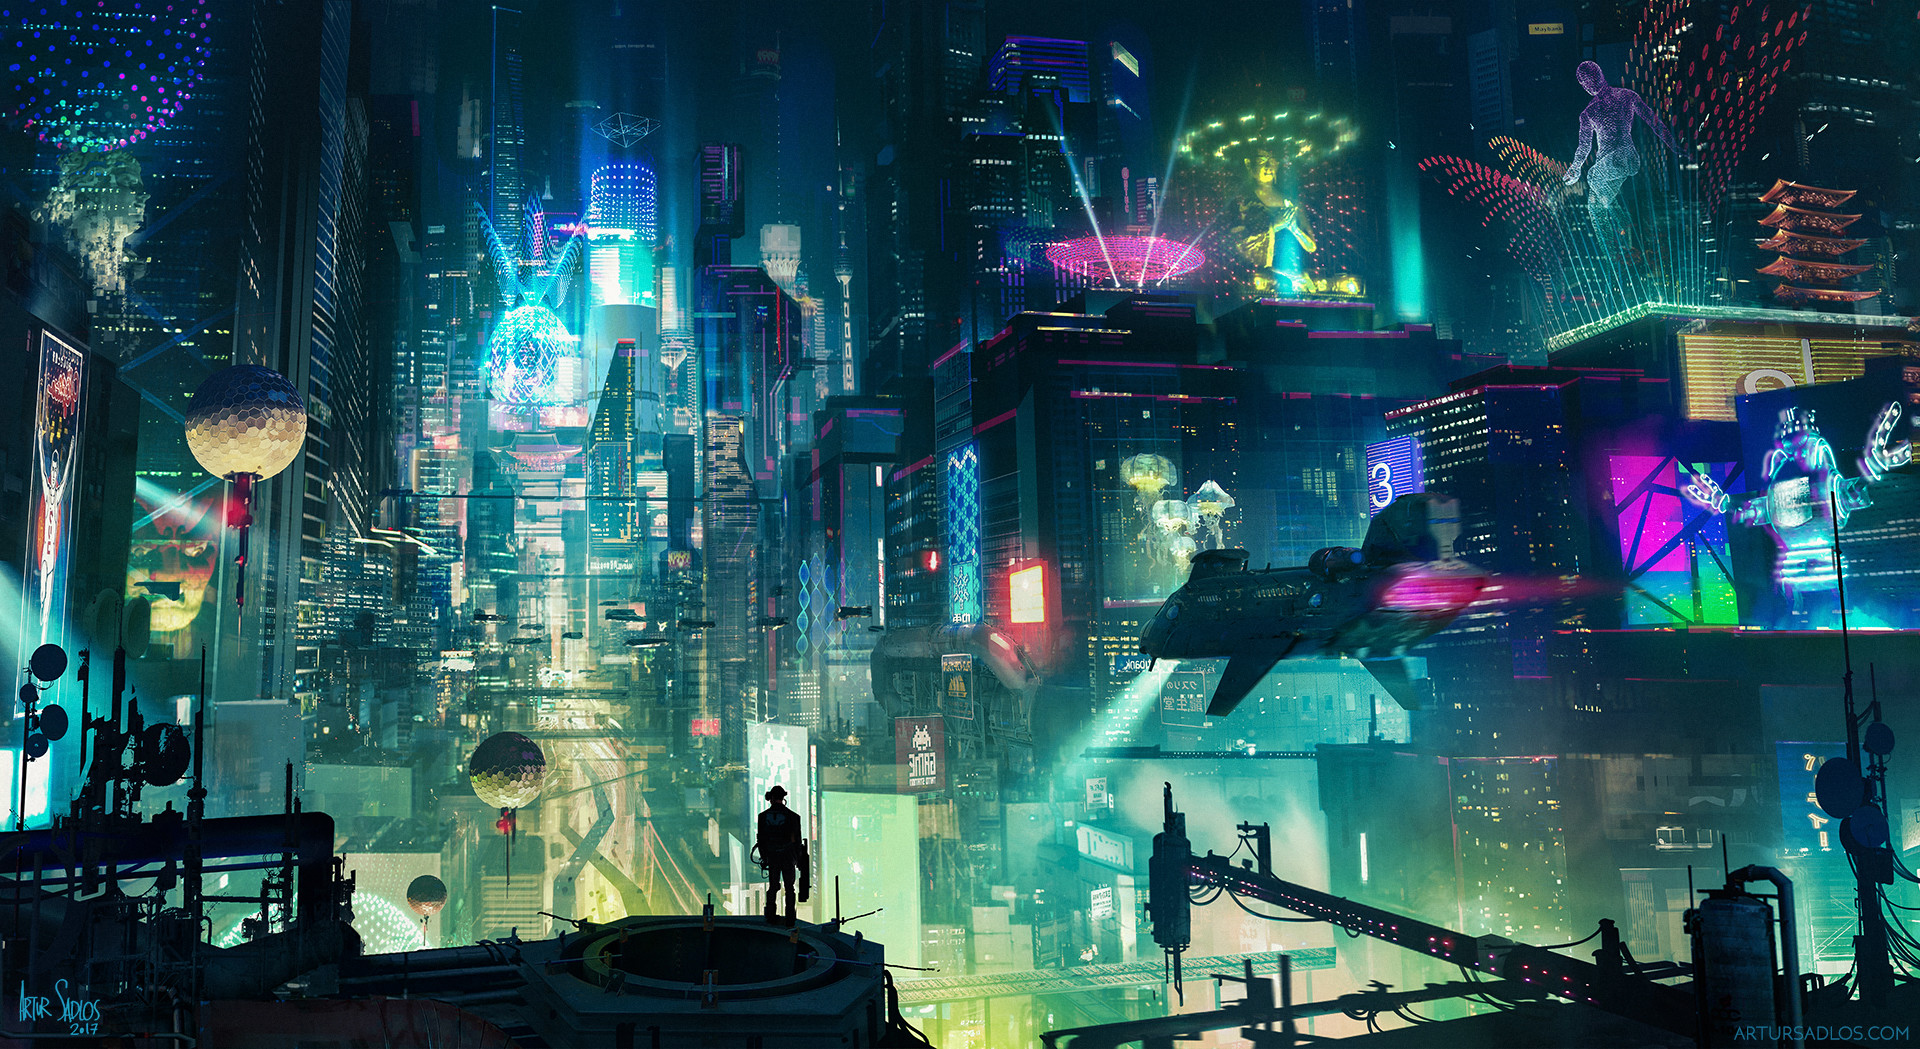 General 1920x1049 cyberpunk cityscape cityscape city skyscraper building futuristic futuristic city lights night metropolis  digital art advertisements street light street